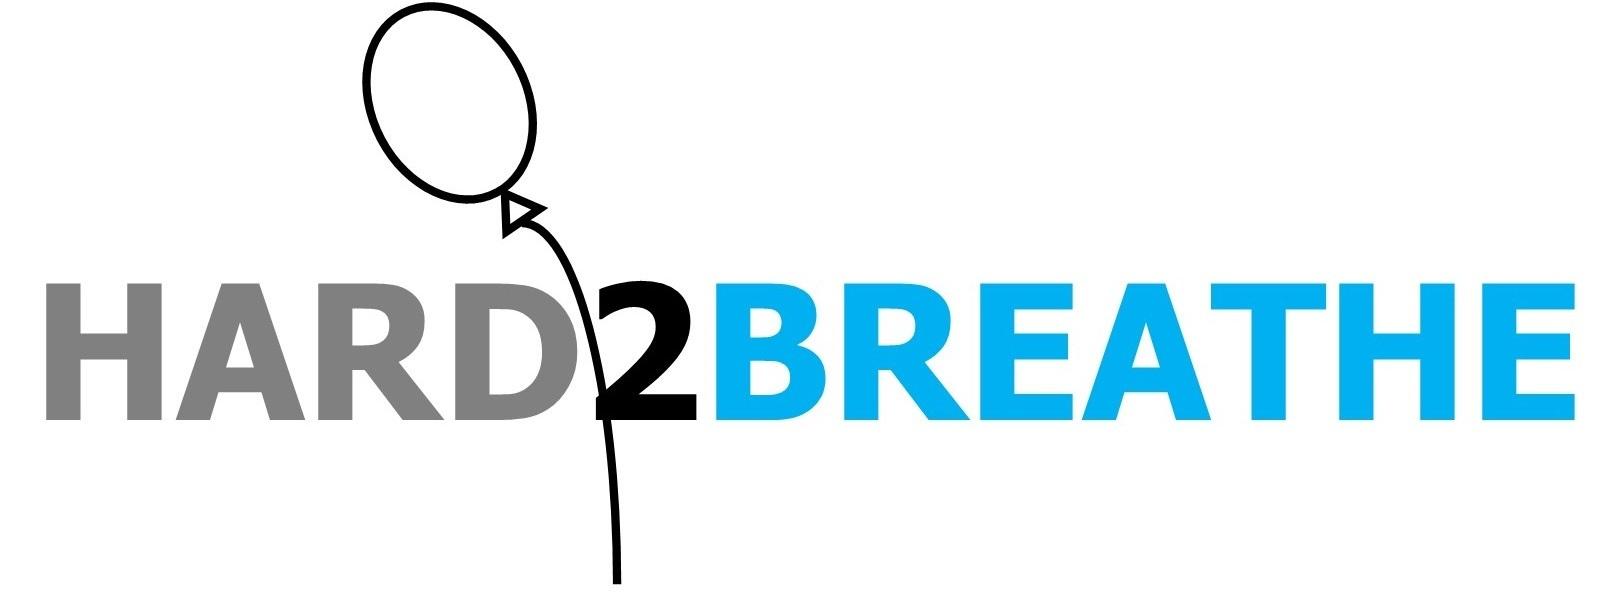 Hard2breathe-logo_160323_105630.jpg#asse